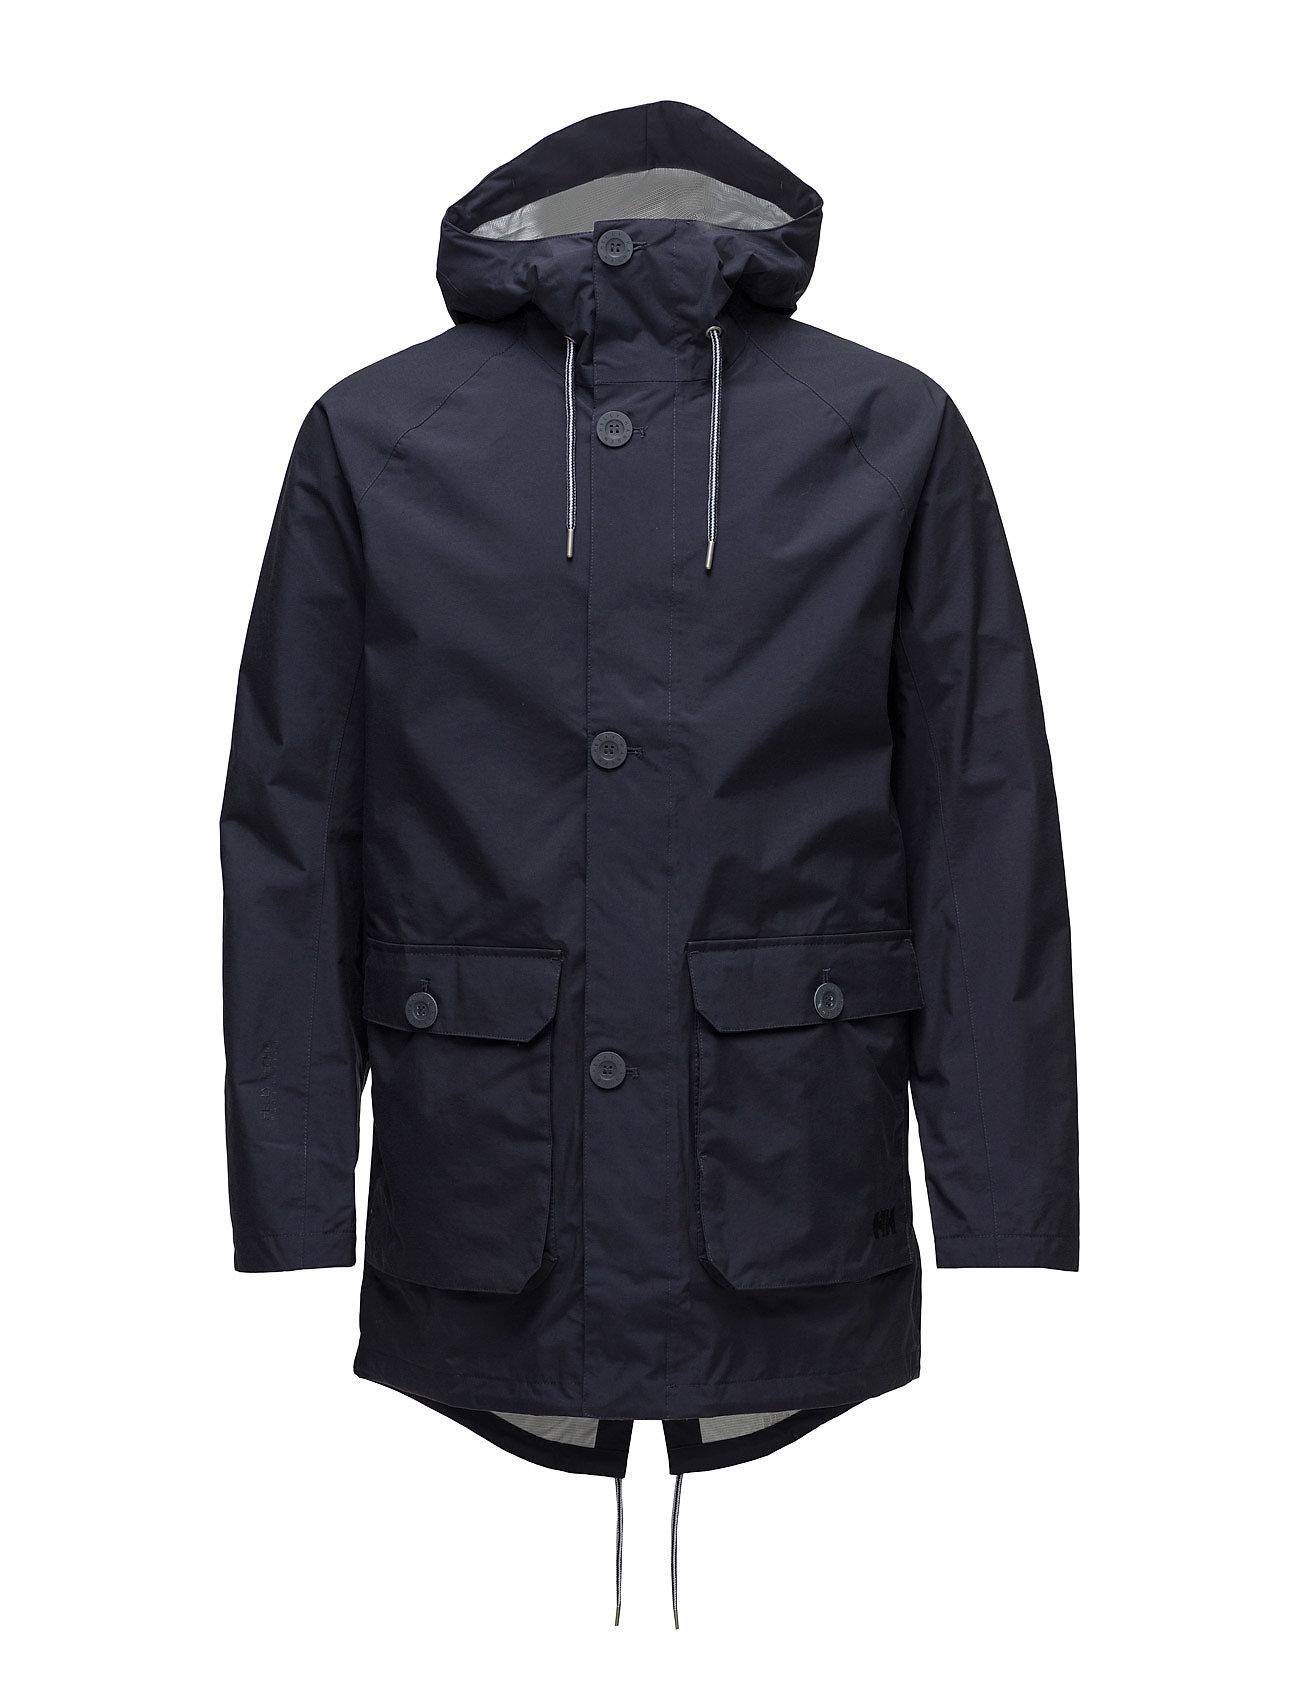 Raincoat994 BlueHelly Hansen Raincoat994 Elements Graphite BlueHelly Graphite Elements Hansen Elements Raincoat994 CsQthdrx